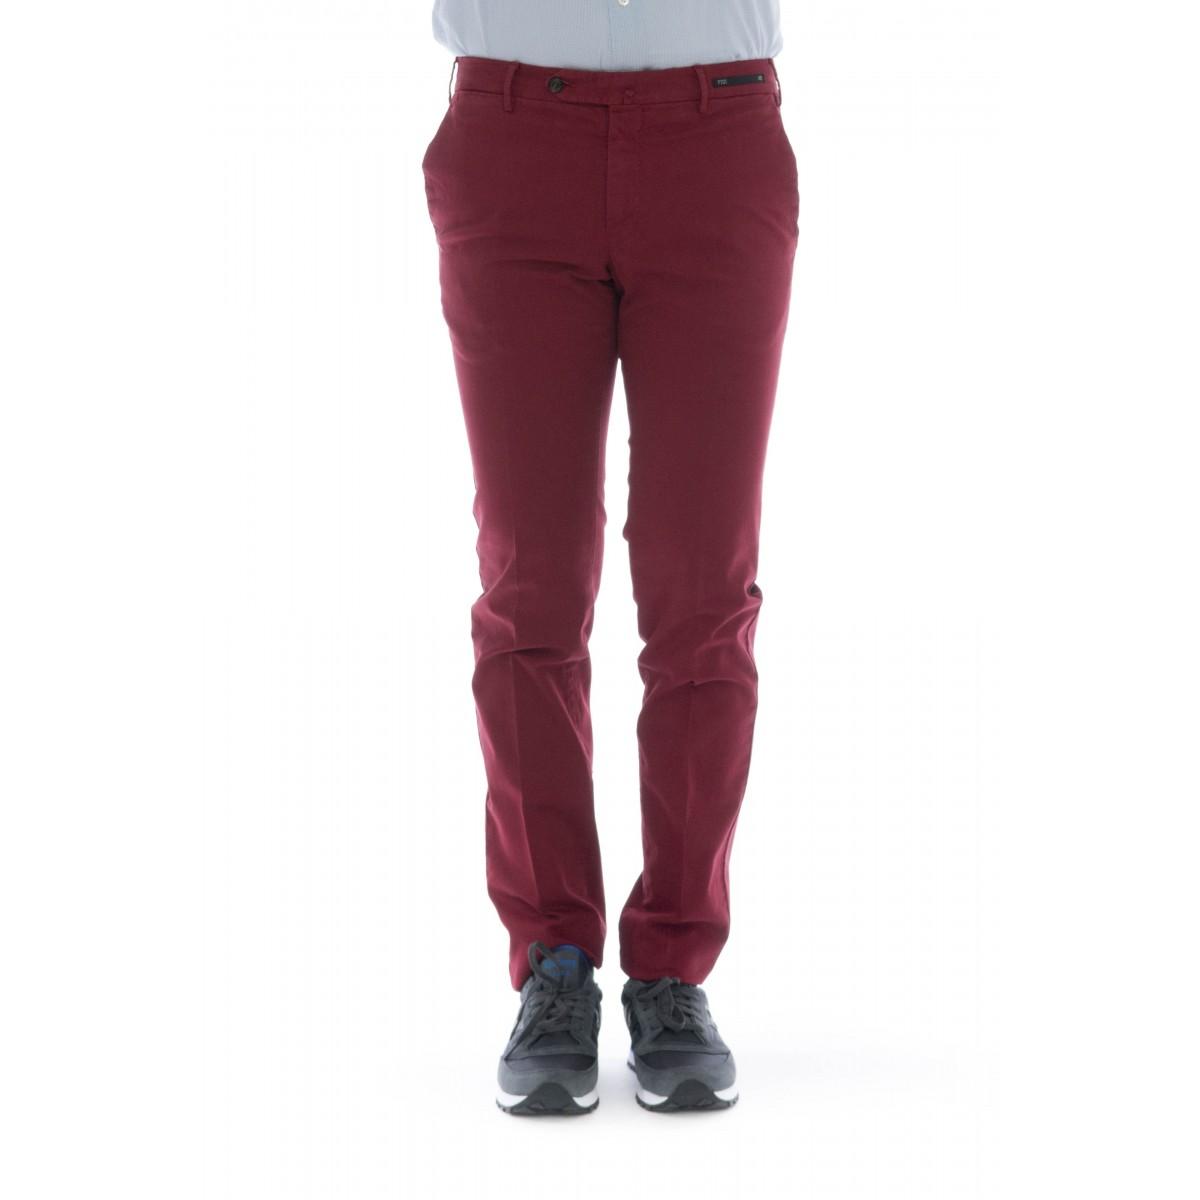 Pantalone uomo - Cpdt01z tt02 super slim gabardina strech